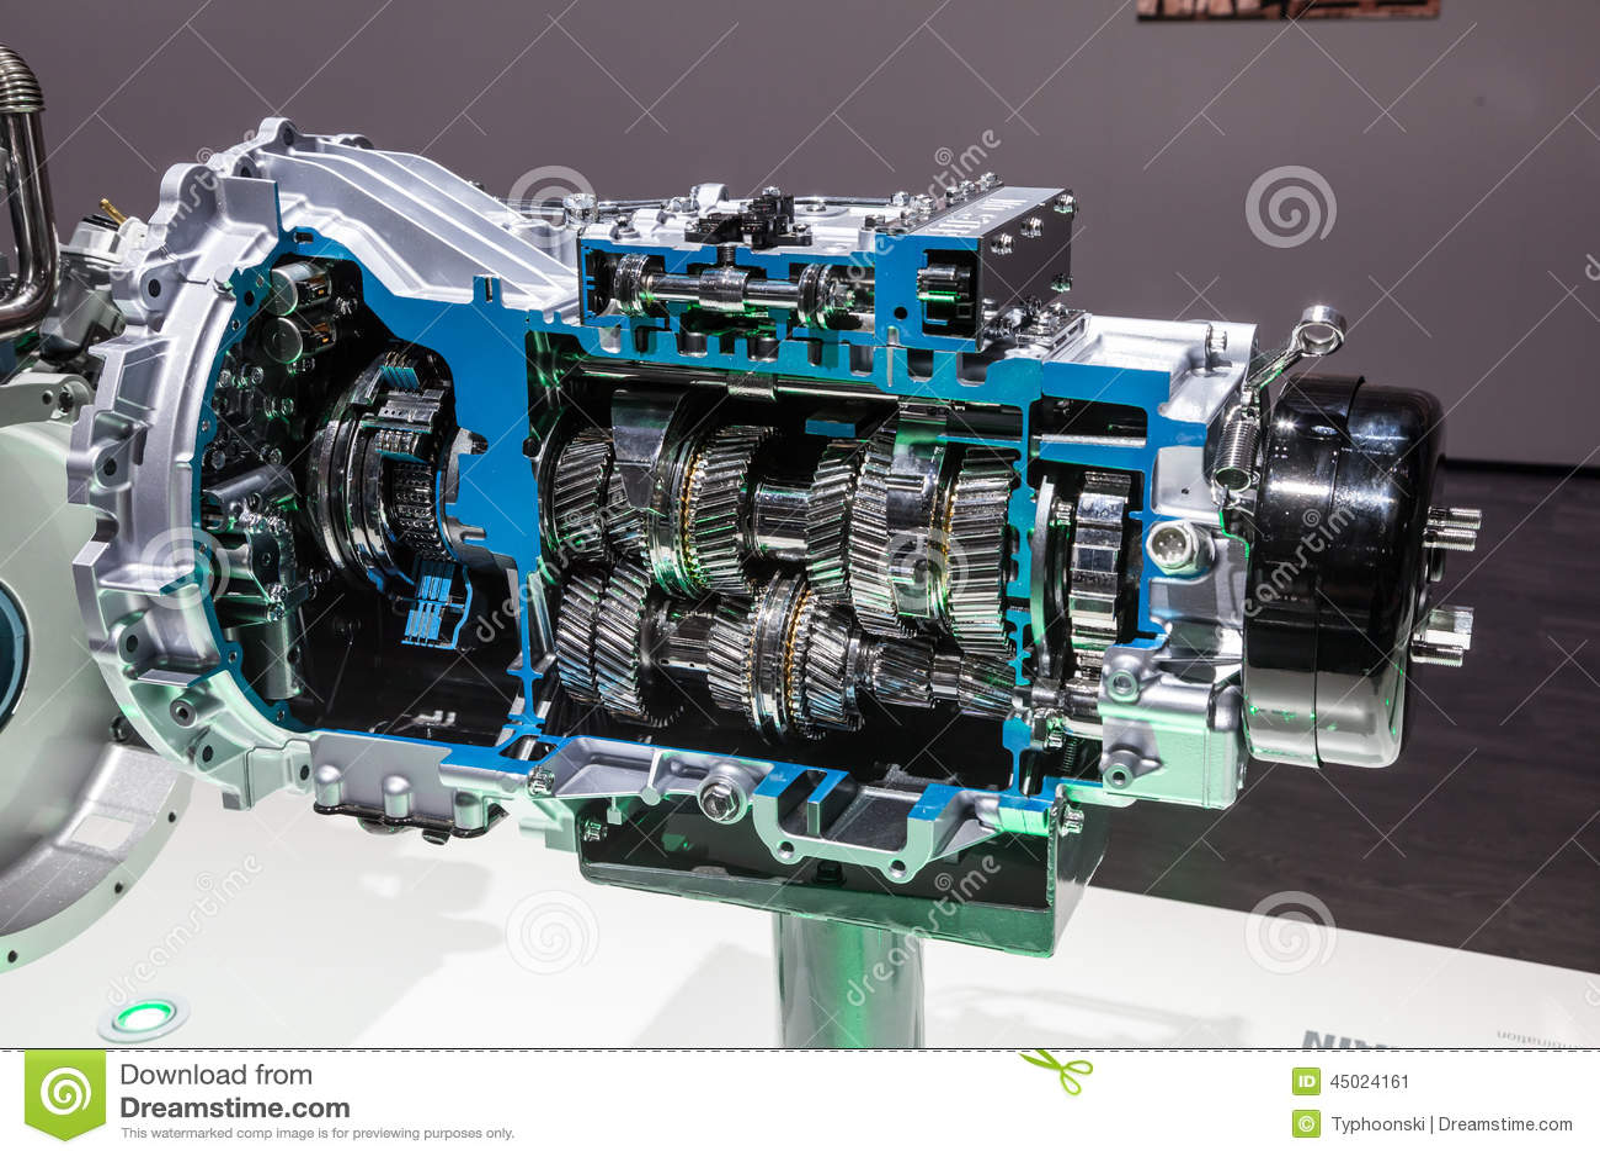 New Mitsubishi automatic gearbox